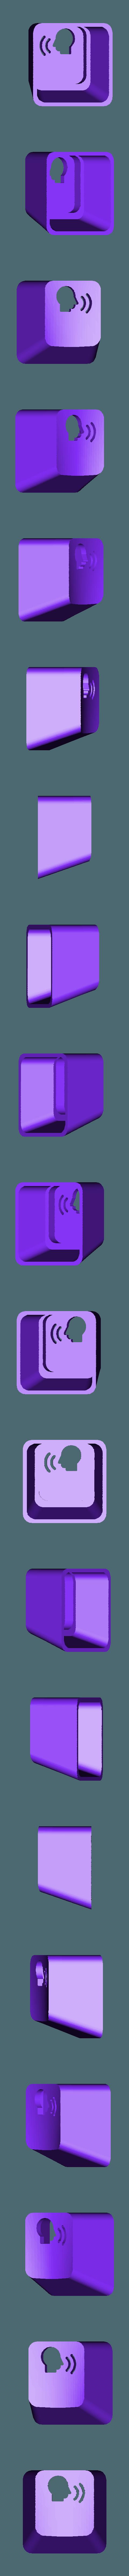 key_voice1.stl Download free STL file Key cap • 3D printing object, MakeItWork